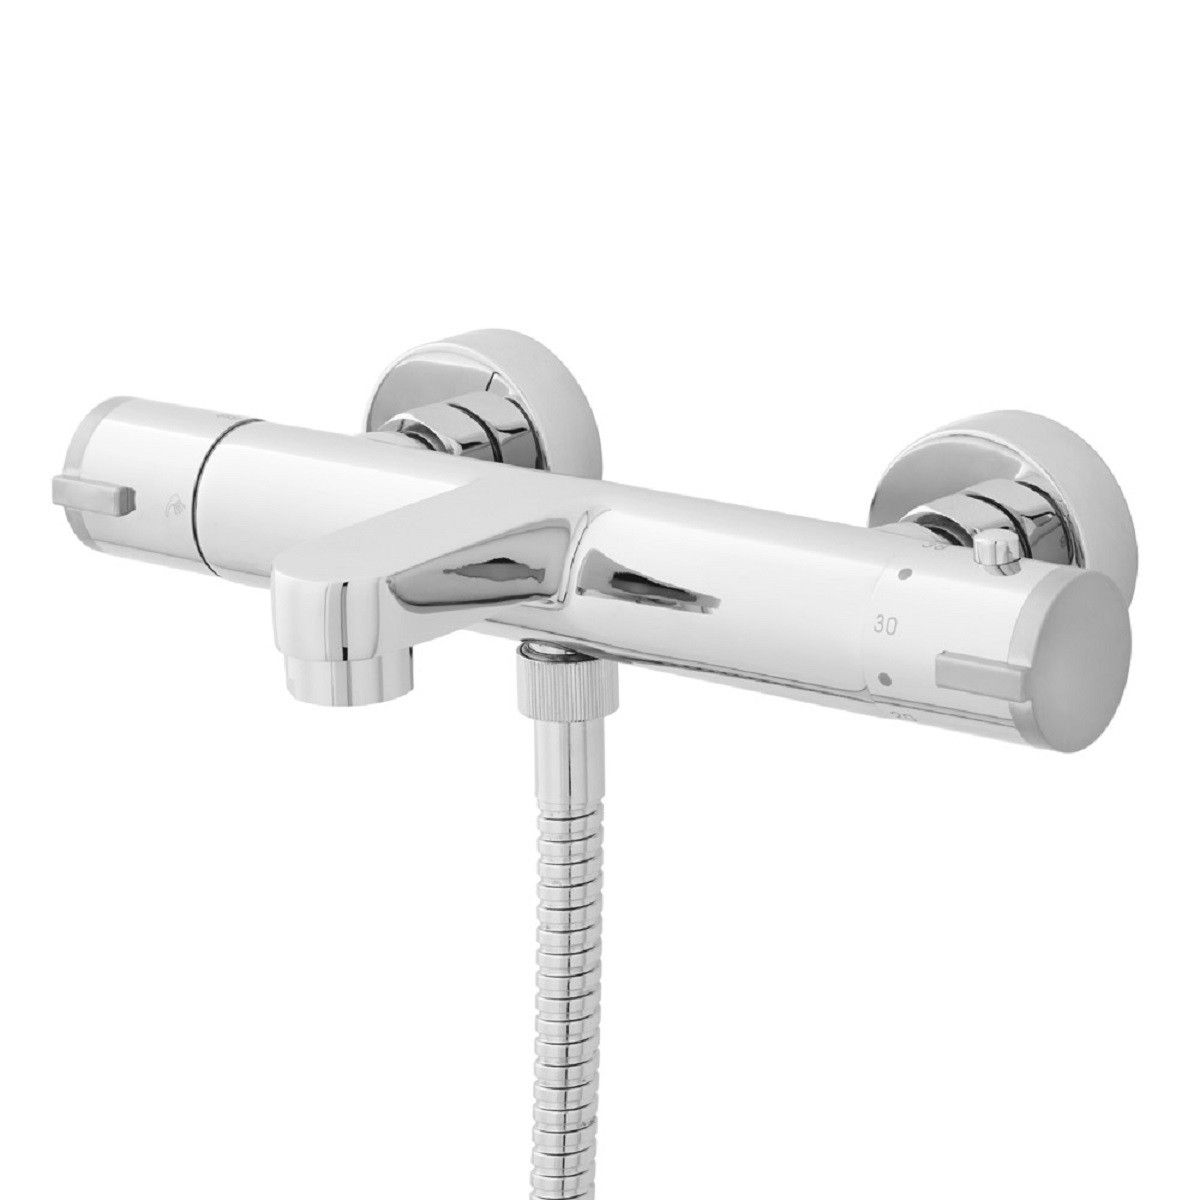 Ultra Thermostatic Bath Shower Mixer Tap Vbs021 | design | Pinterest ...